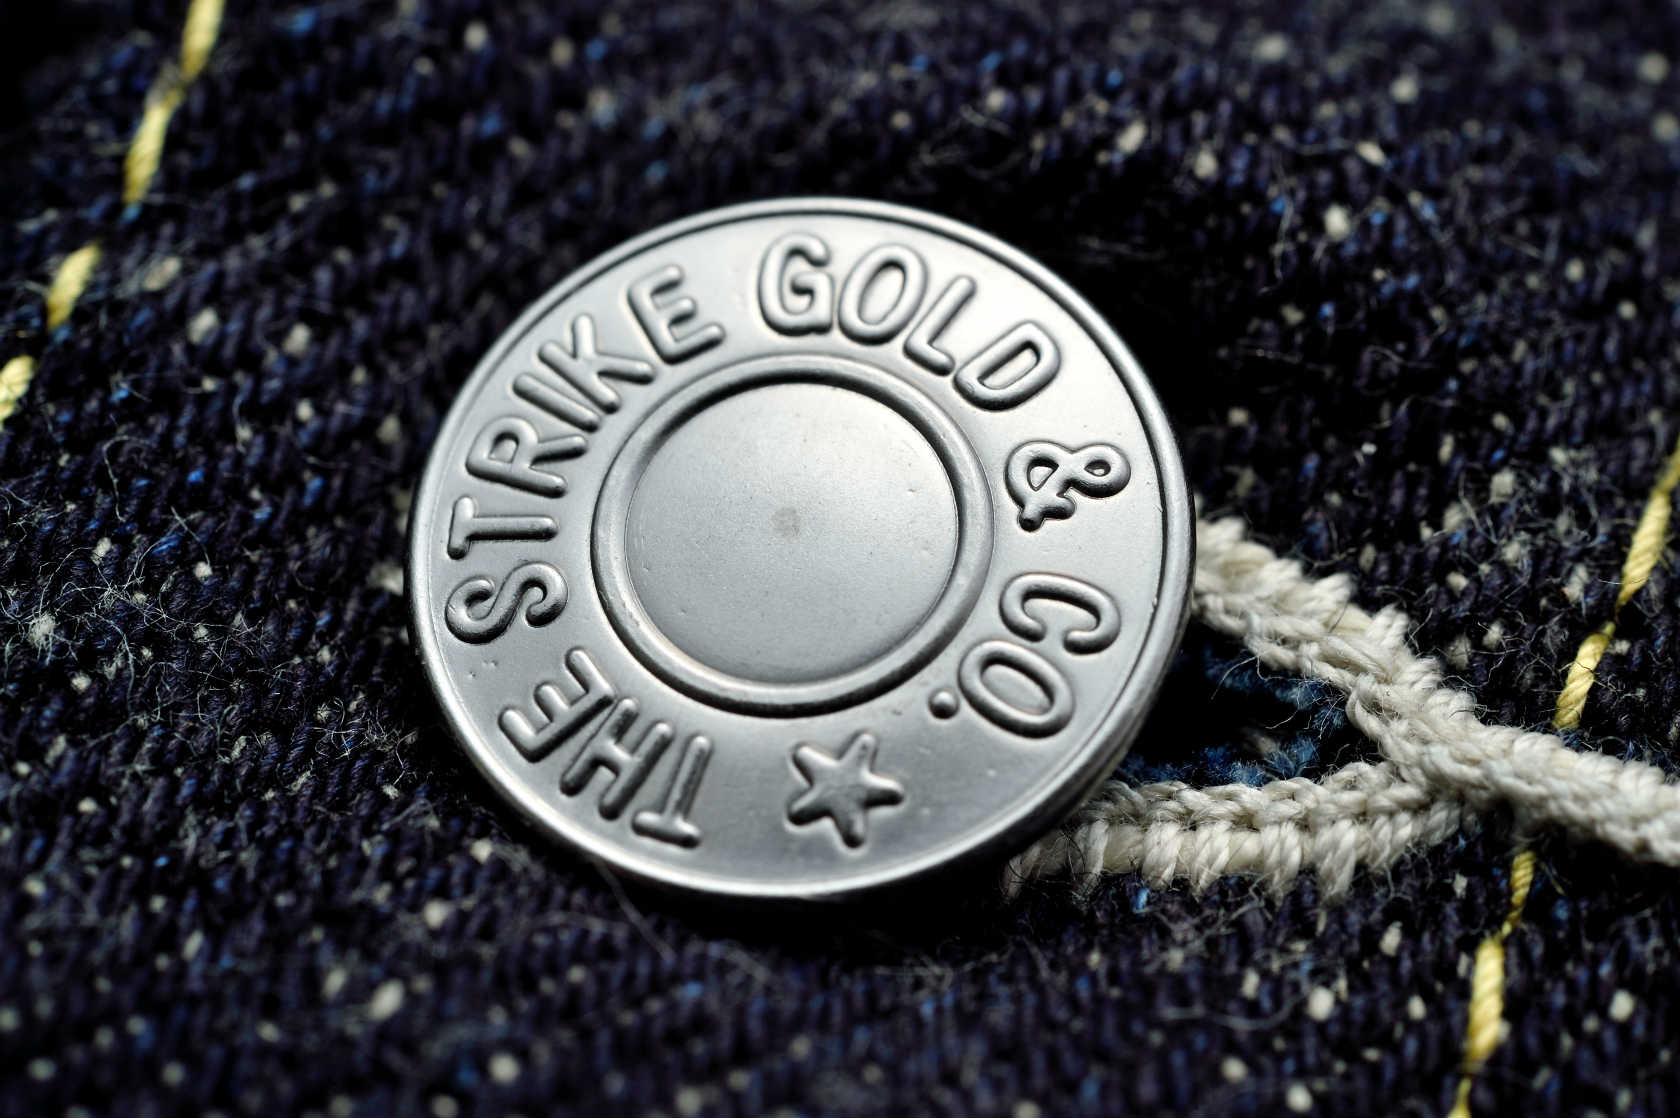 【SGJ50S】 The Strike Gold ストライクゴールド デニムジャケットDENIM JACKET Gジャン